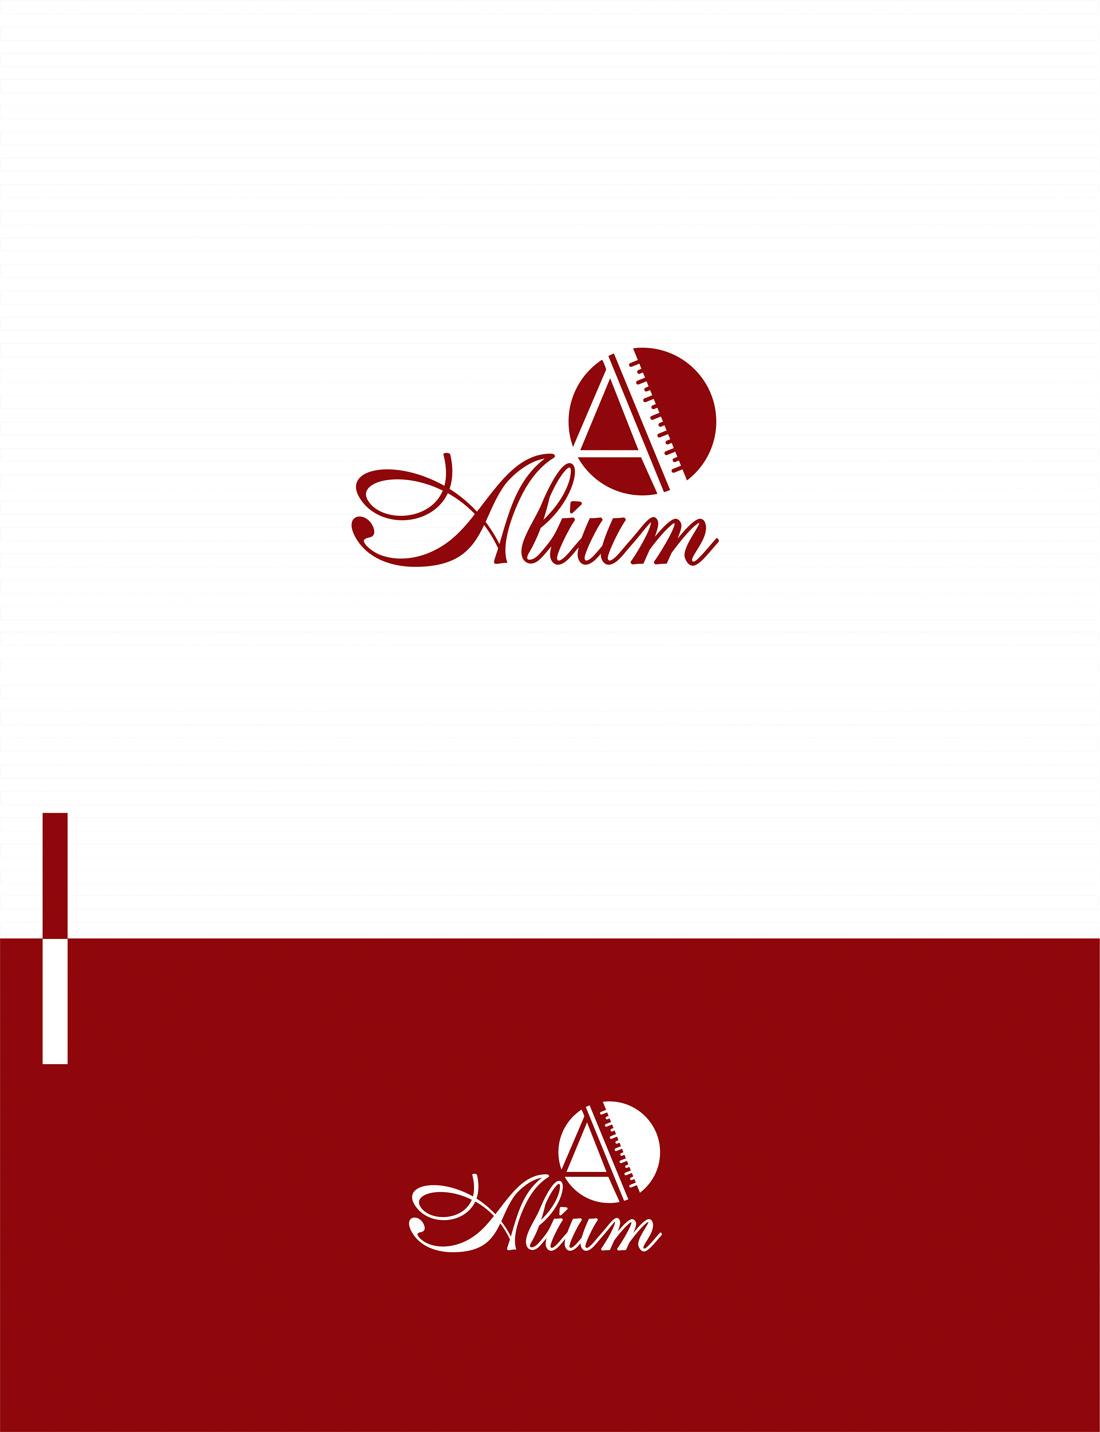 Логотип для дизайн студии фото f_08859e06e2beeddc.jpg